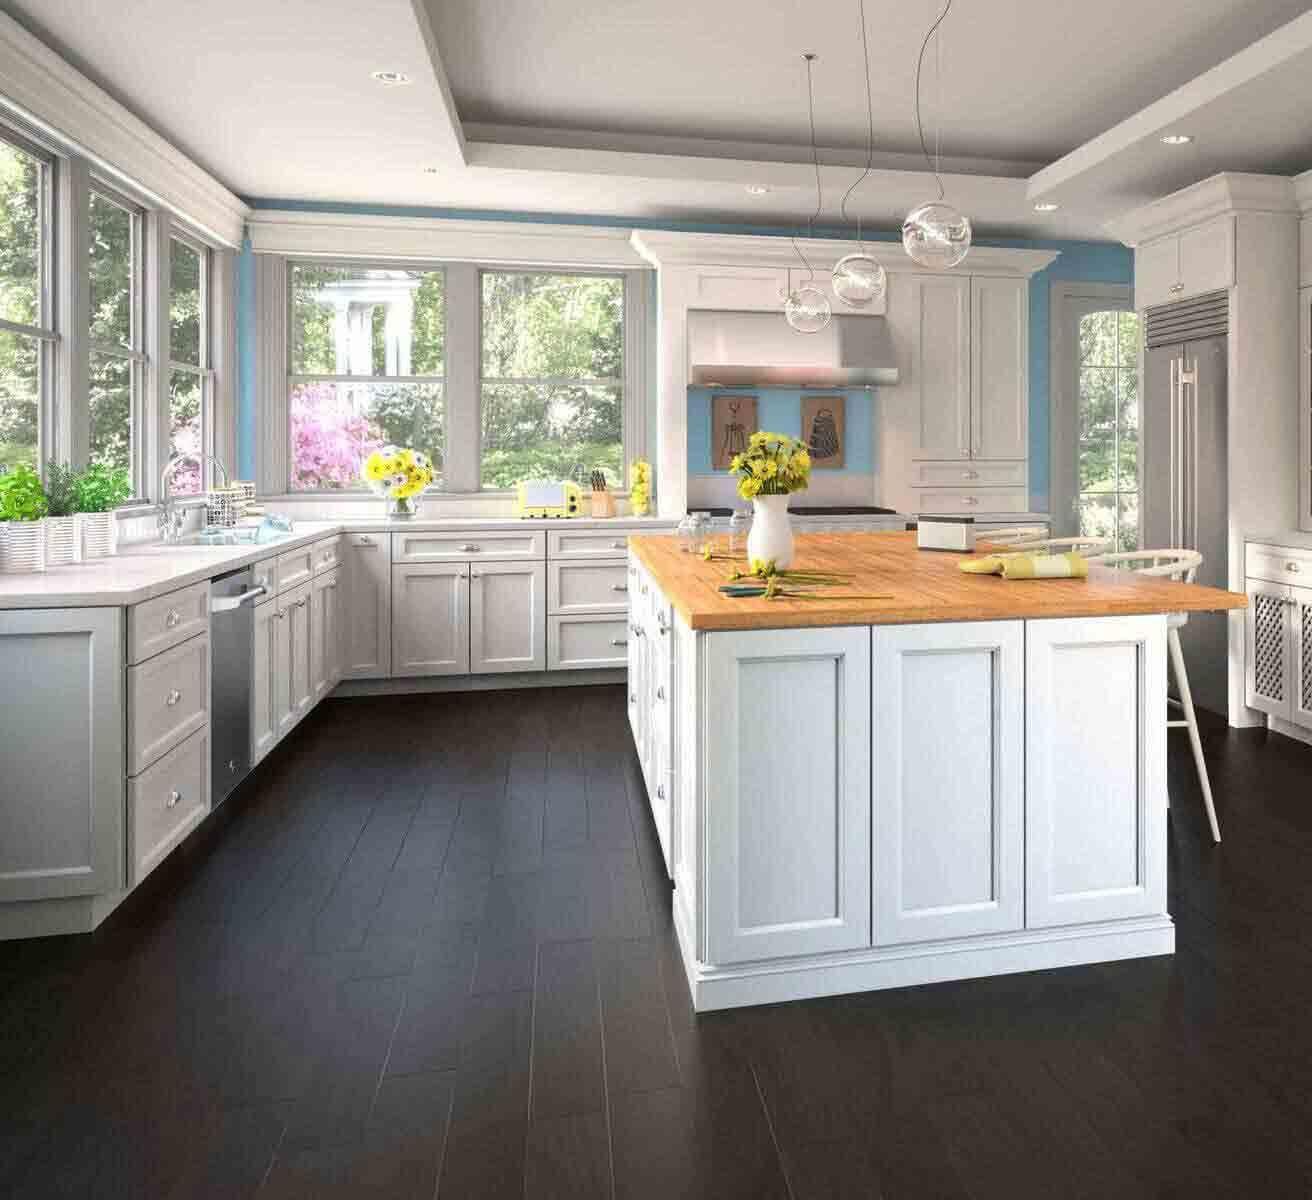 Perfection Kitchens Kitchen Cabinets Kitchen Design Bathroom Vanities Countertops Kitchen Kitchen Cabinet Styles Refacing Kitchen Cabinets Kitchen Style